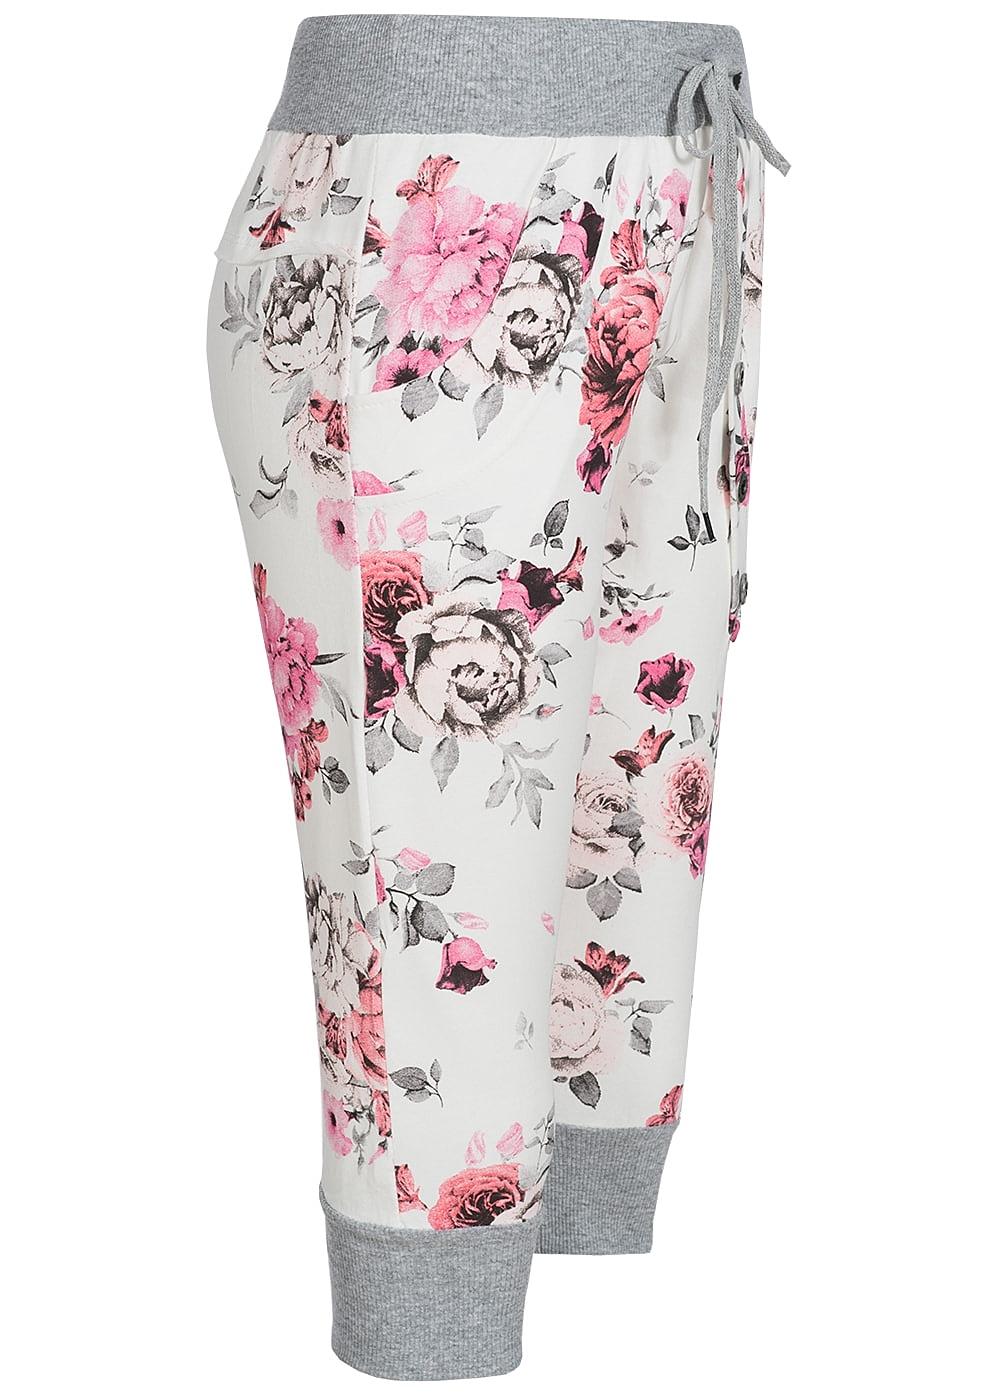 styleboom fashion damen capri sweat short blumen muster weiss rosa pink 77onlineshop. Black Bedroom Furniture Sets. Home Design Ideas